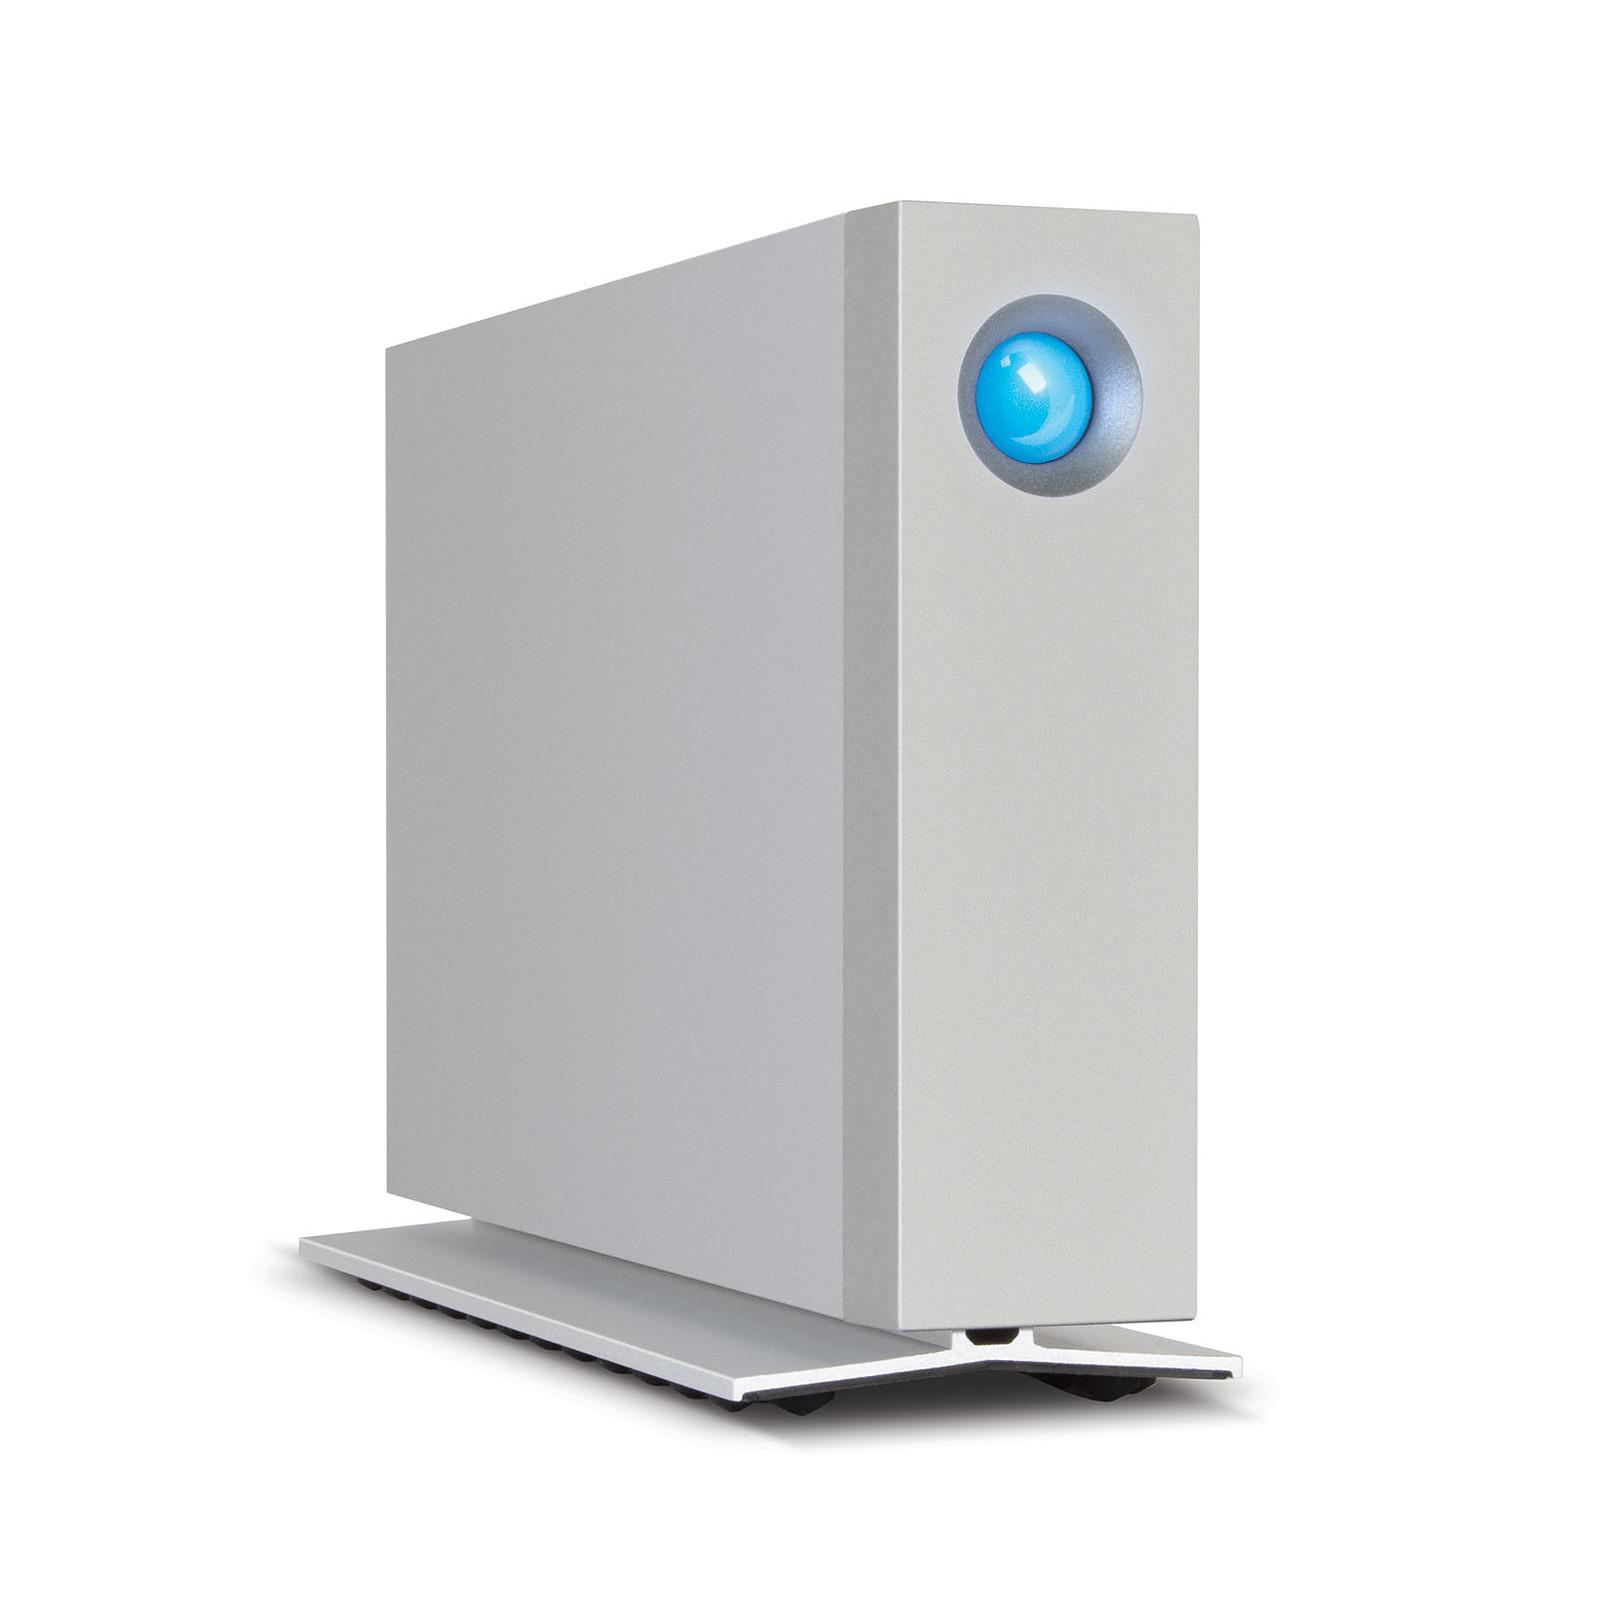 LaCie d2 USB 3.0 (6 To)